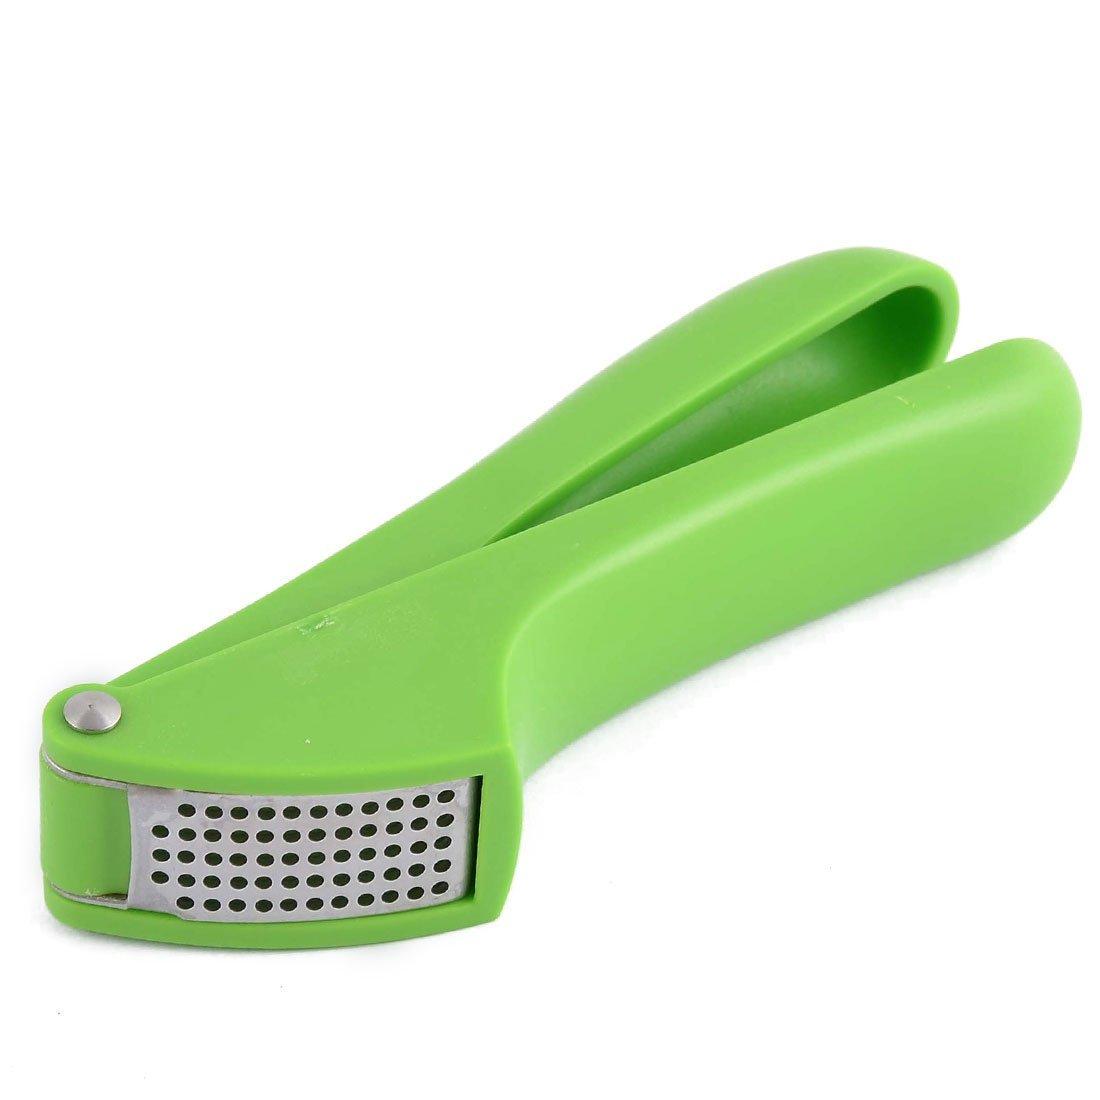 Amazon.com: eDealMax mango de plástico de cocina Inicio Gadget mano Squeeze Exprimidor jengibre prensa de ajo verde: Kitchen & Dining